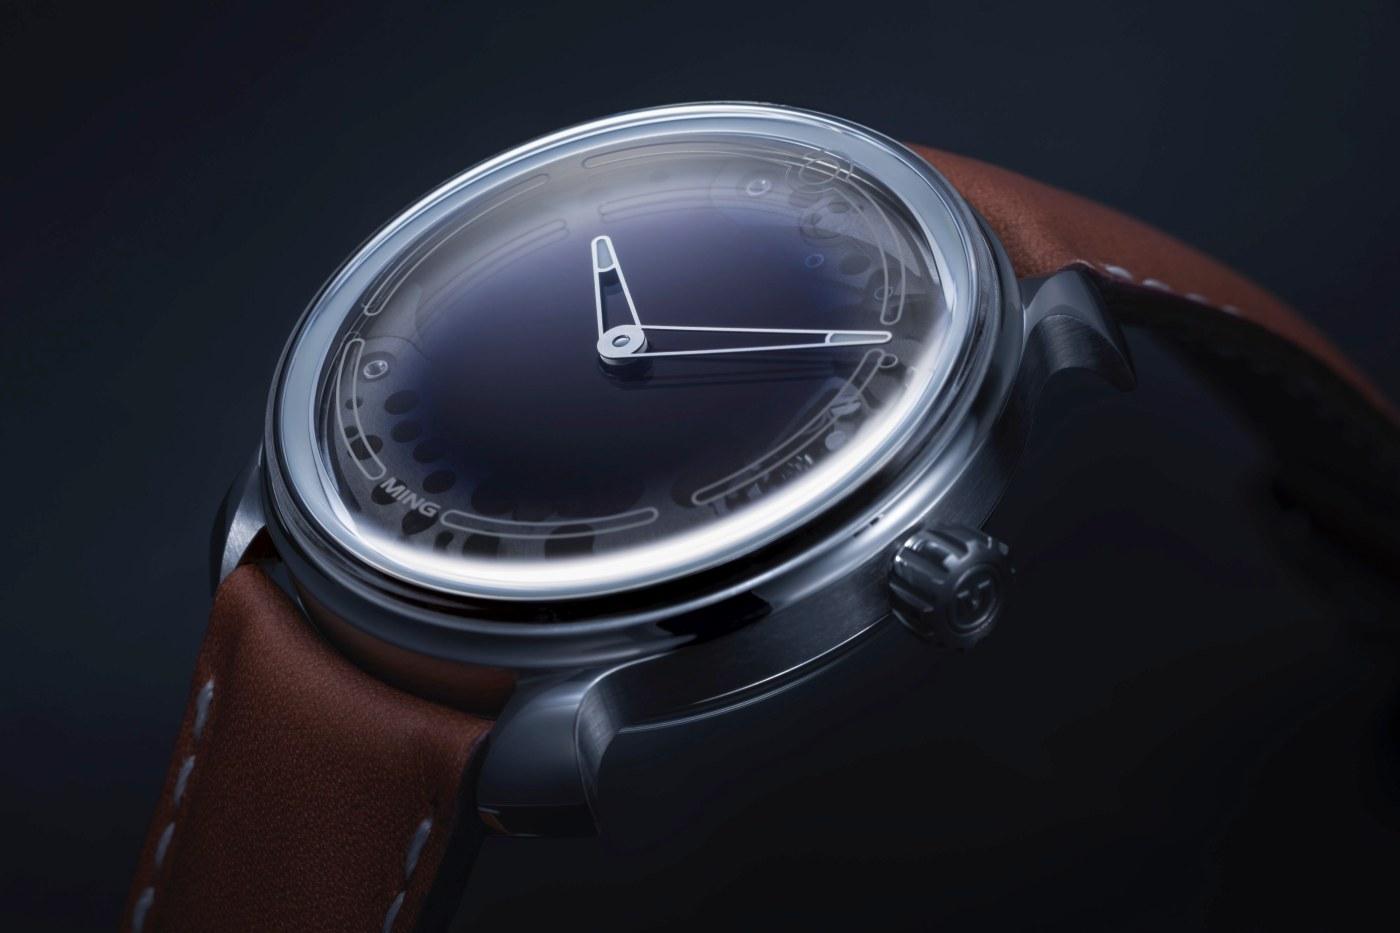 Ming 19.01 wristwatch